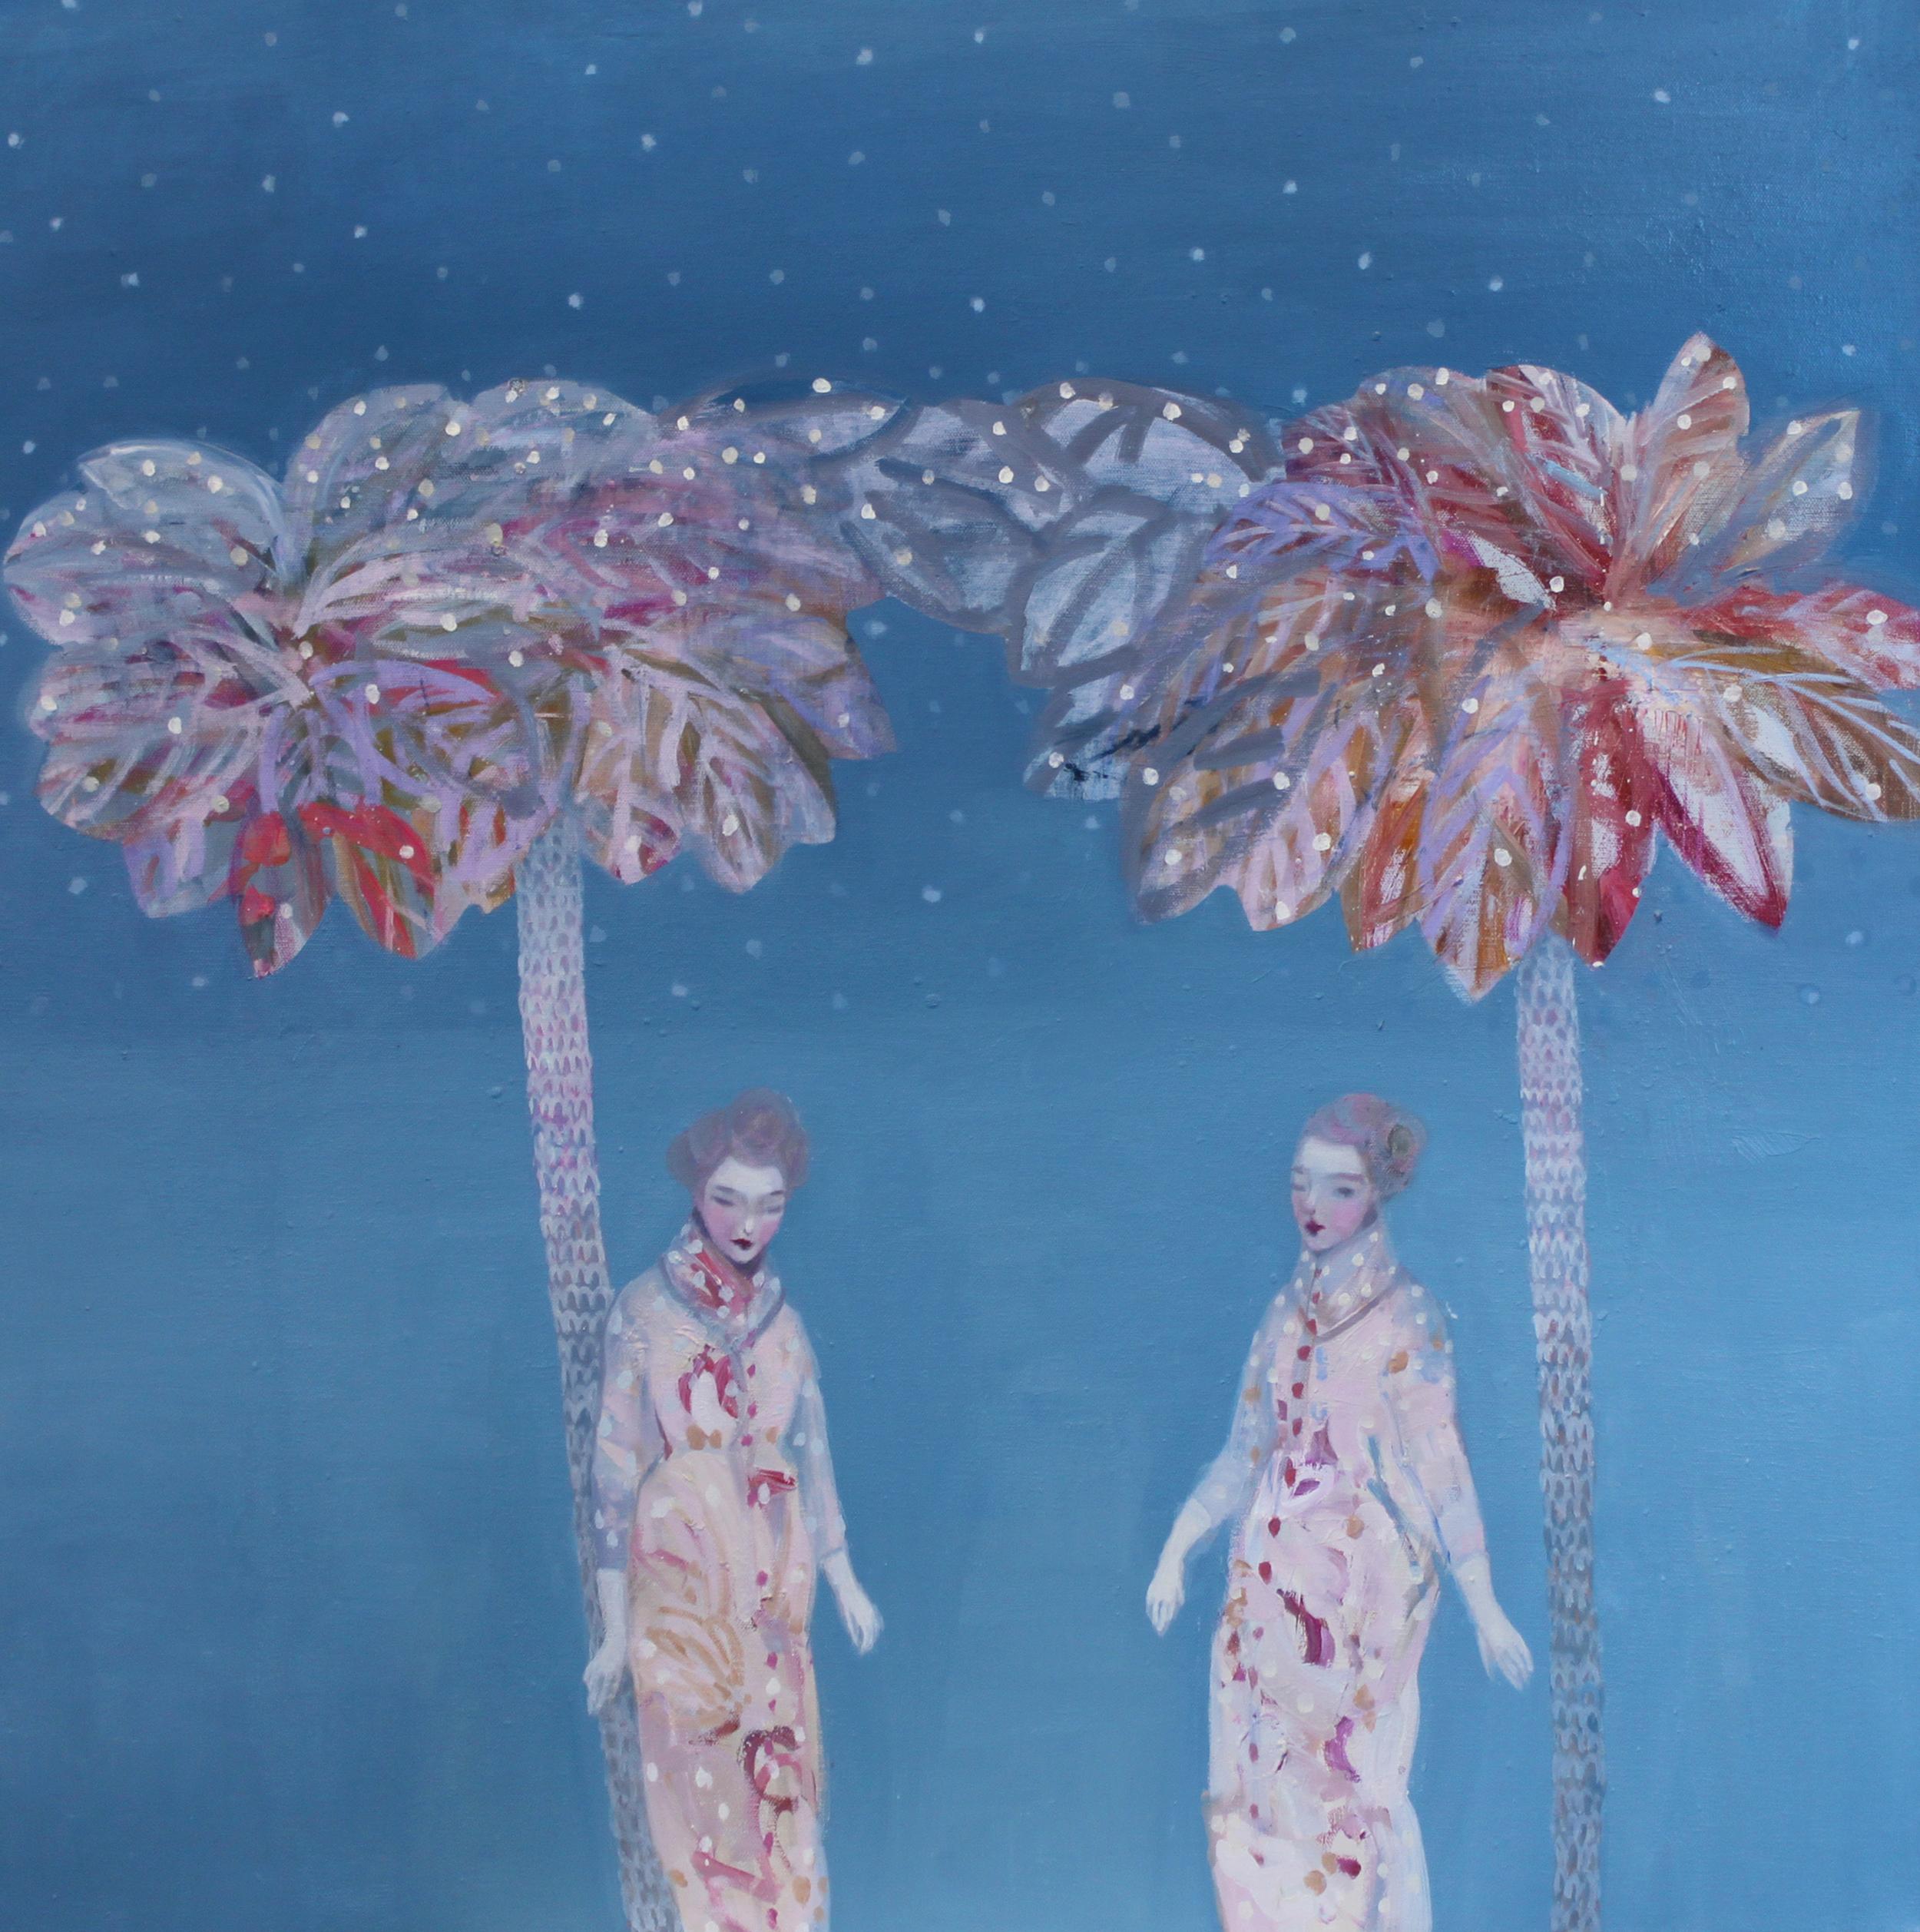 K r i s t i n V e s t g a r d  Silent Encounter 80 x 80 cm  oil on canvas £ 3500